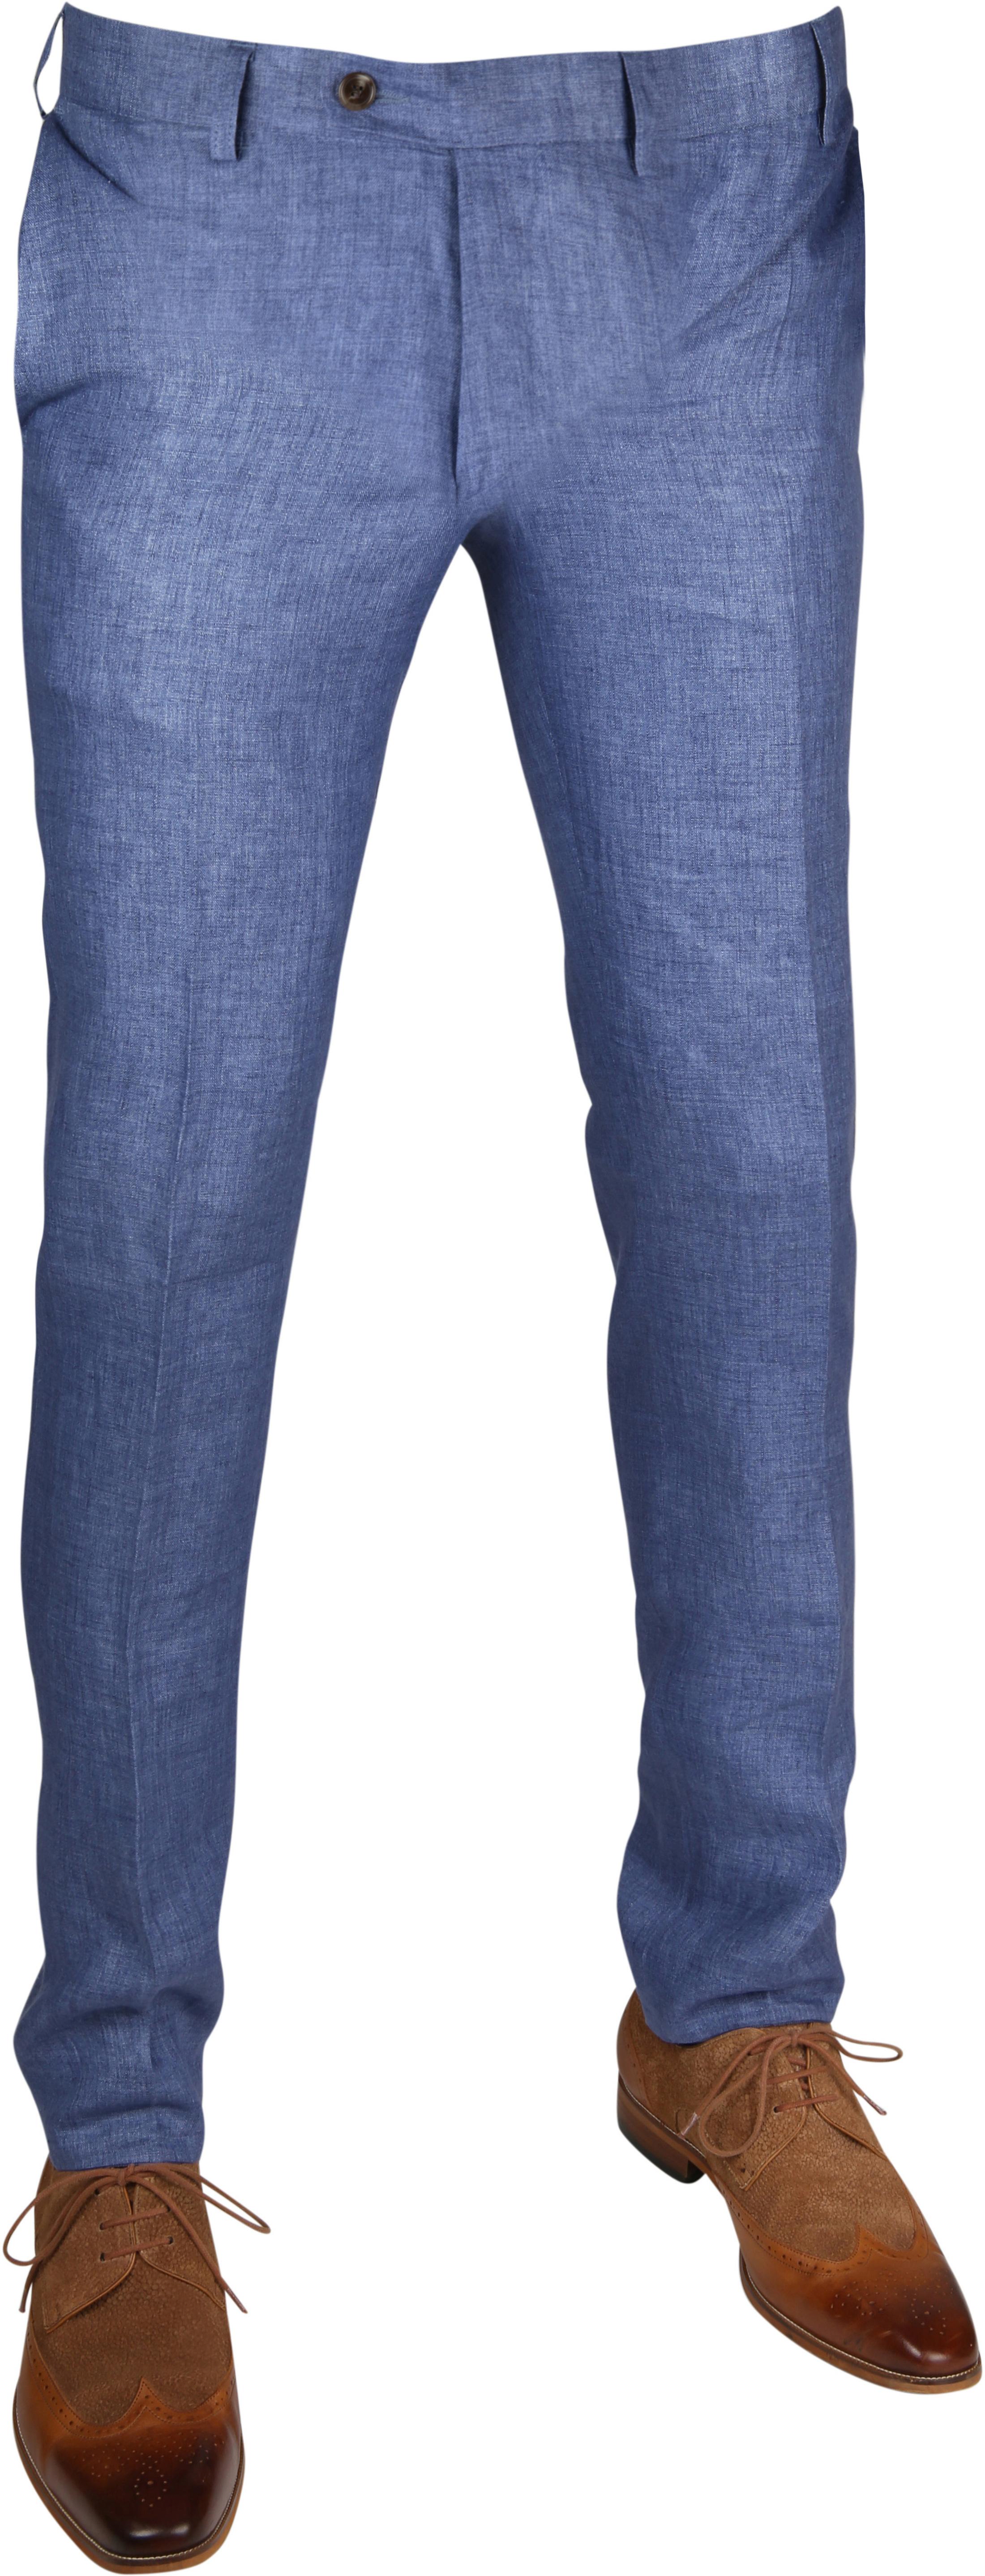 Linnen Pantalon Blauw foto 0